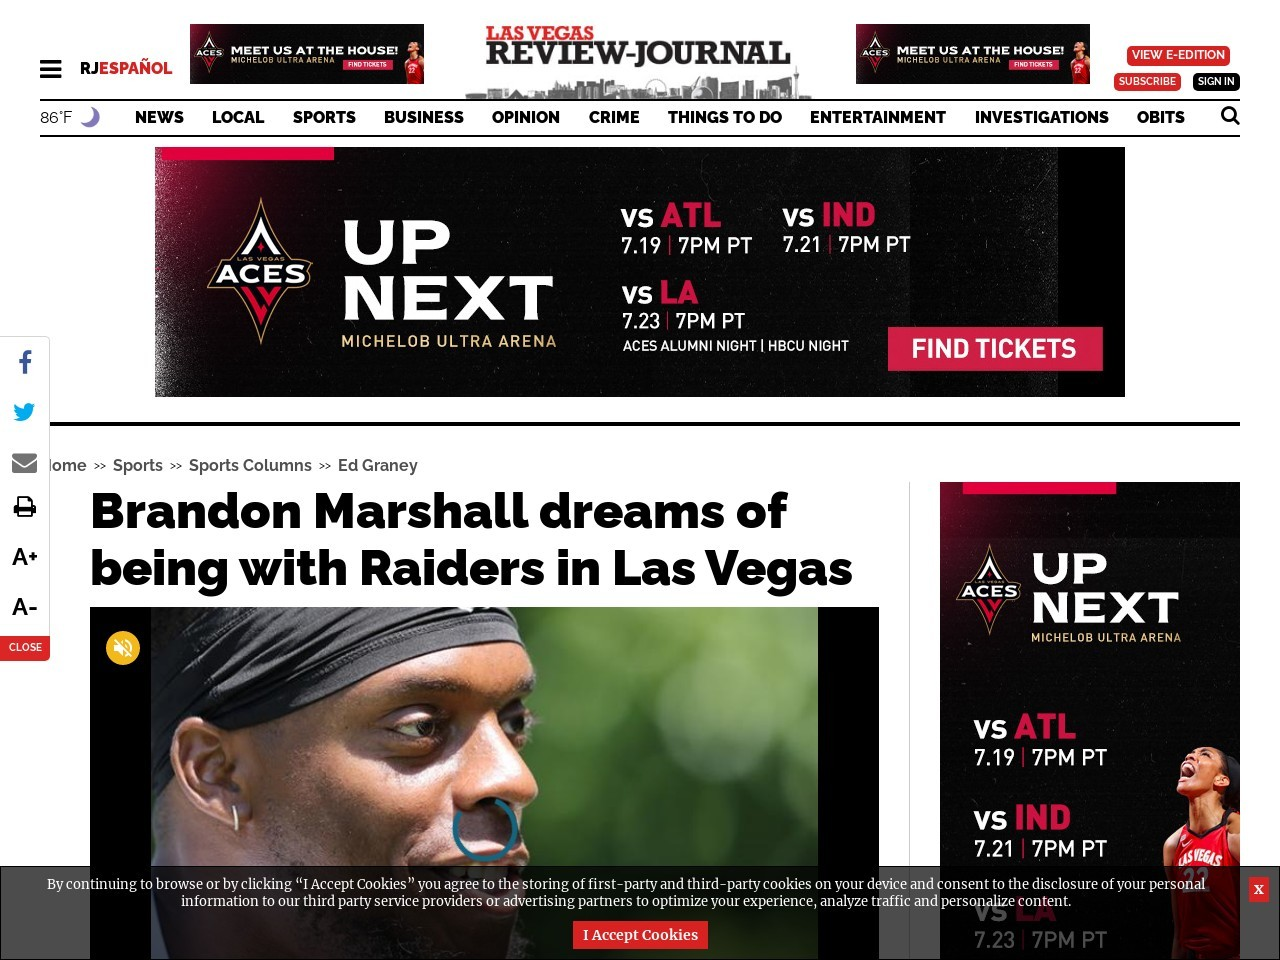 Brandon Marshall dreams of being with Raiders in Las Vegas